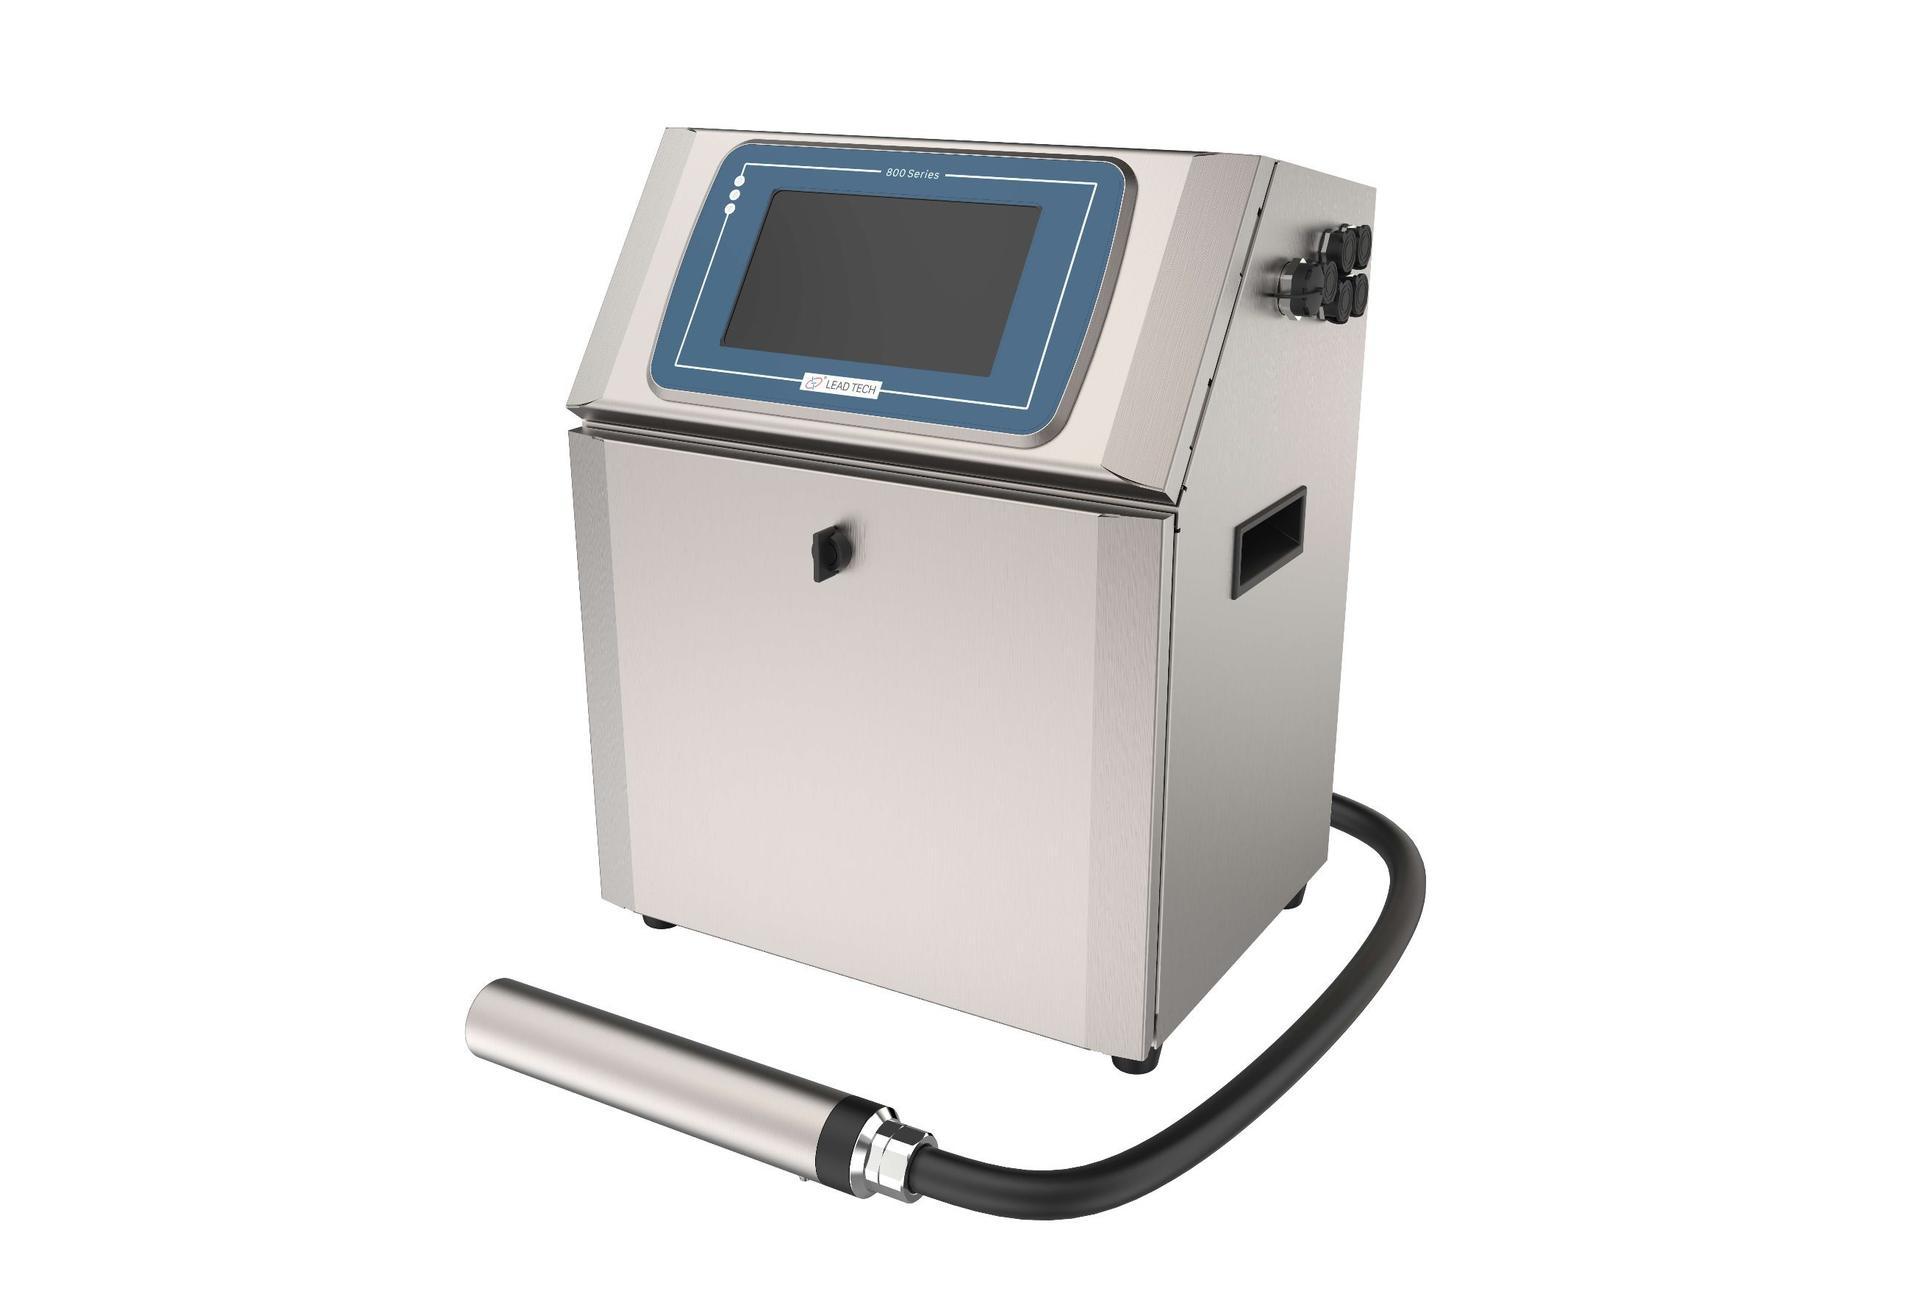 Lead Tech Expiry Date Code Number Warranty Automatic Cij Inkjet Printer Lt800